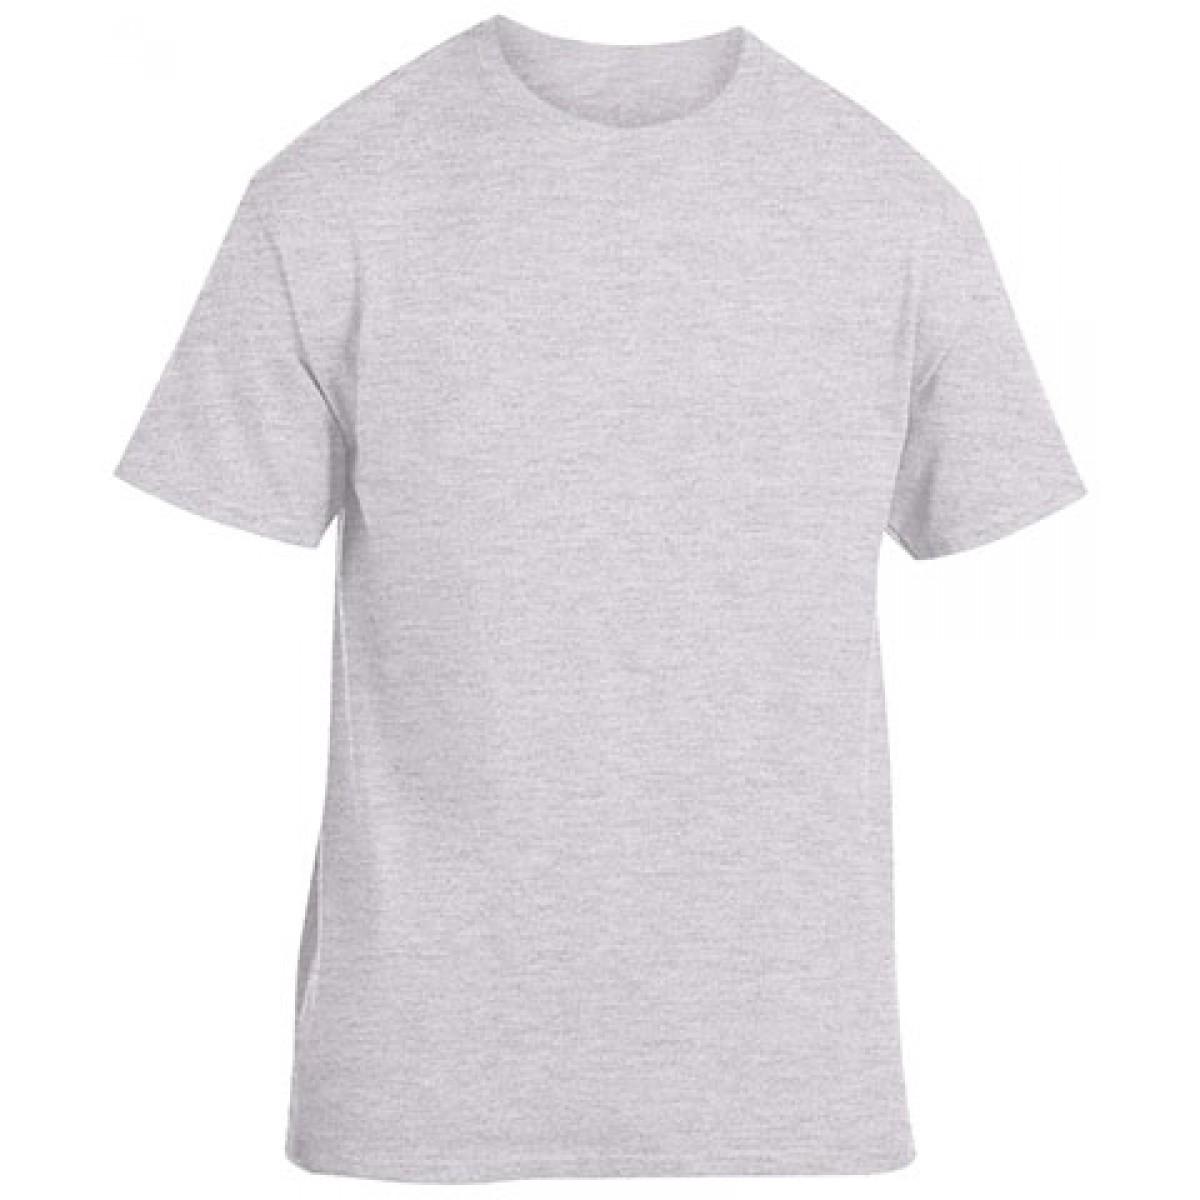 Cotton Short Sleeve T-Shirt-Sports Grey-YS